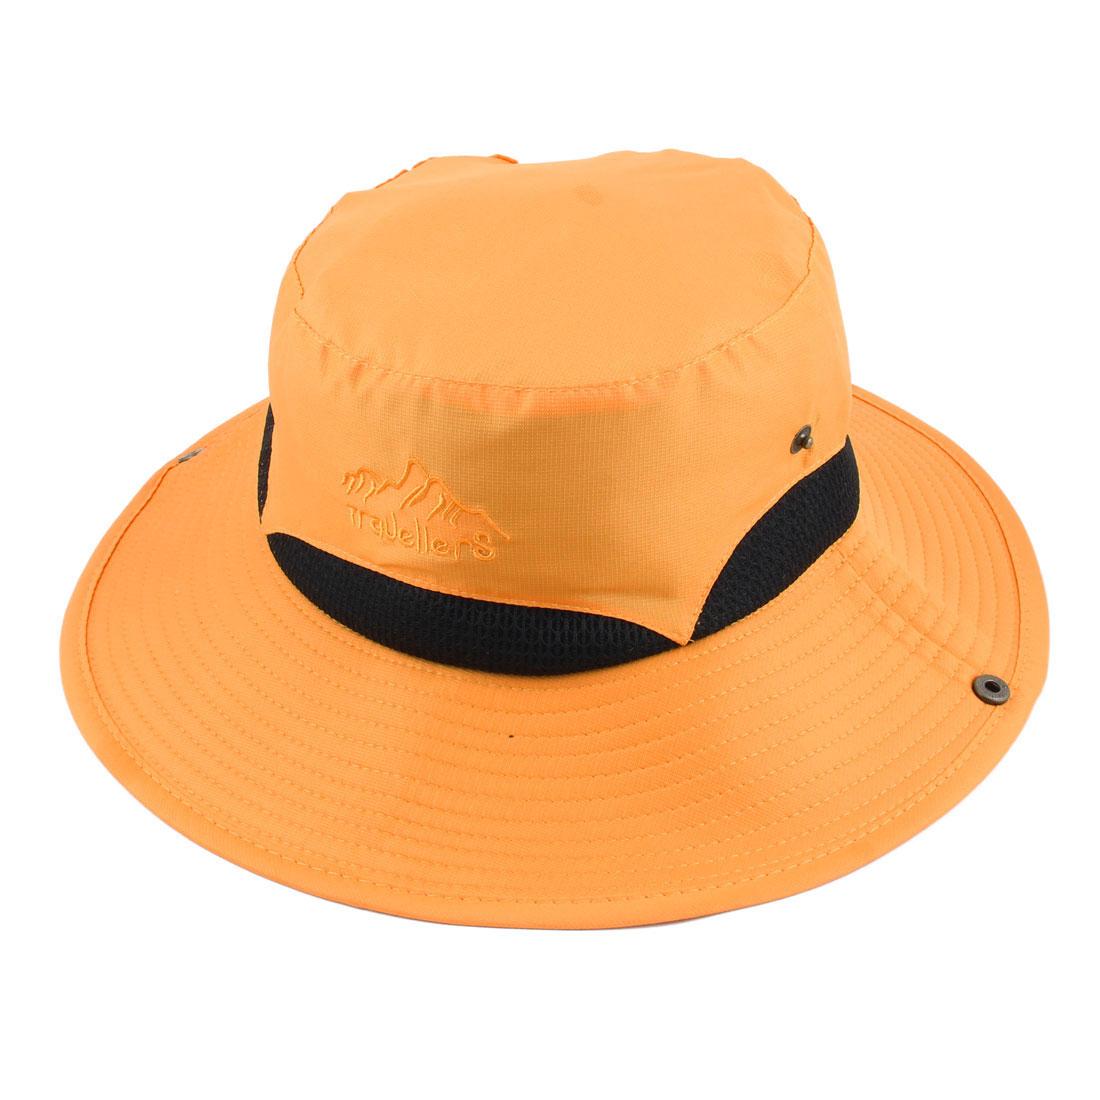 Ladies Women Polyester Foldable Head Decor Summer Protective Traveling Wide Brim Sun Cap Beach Fishing Hat Dark Yellow